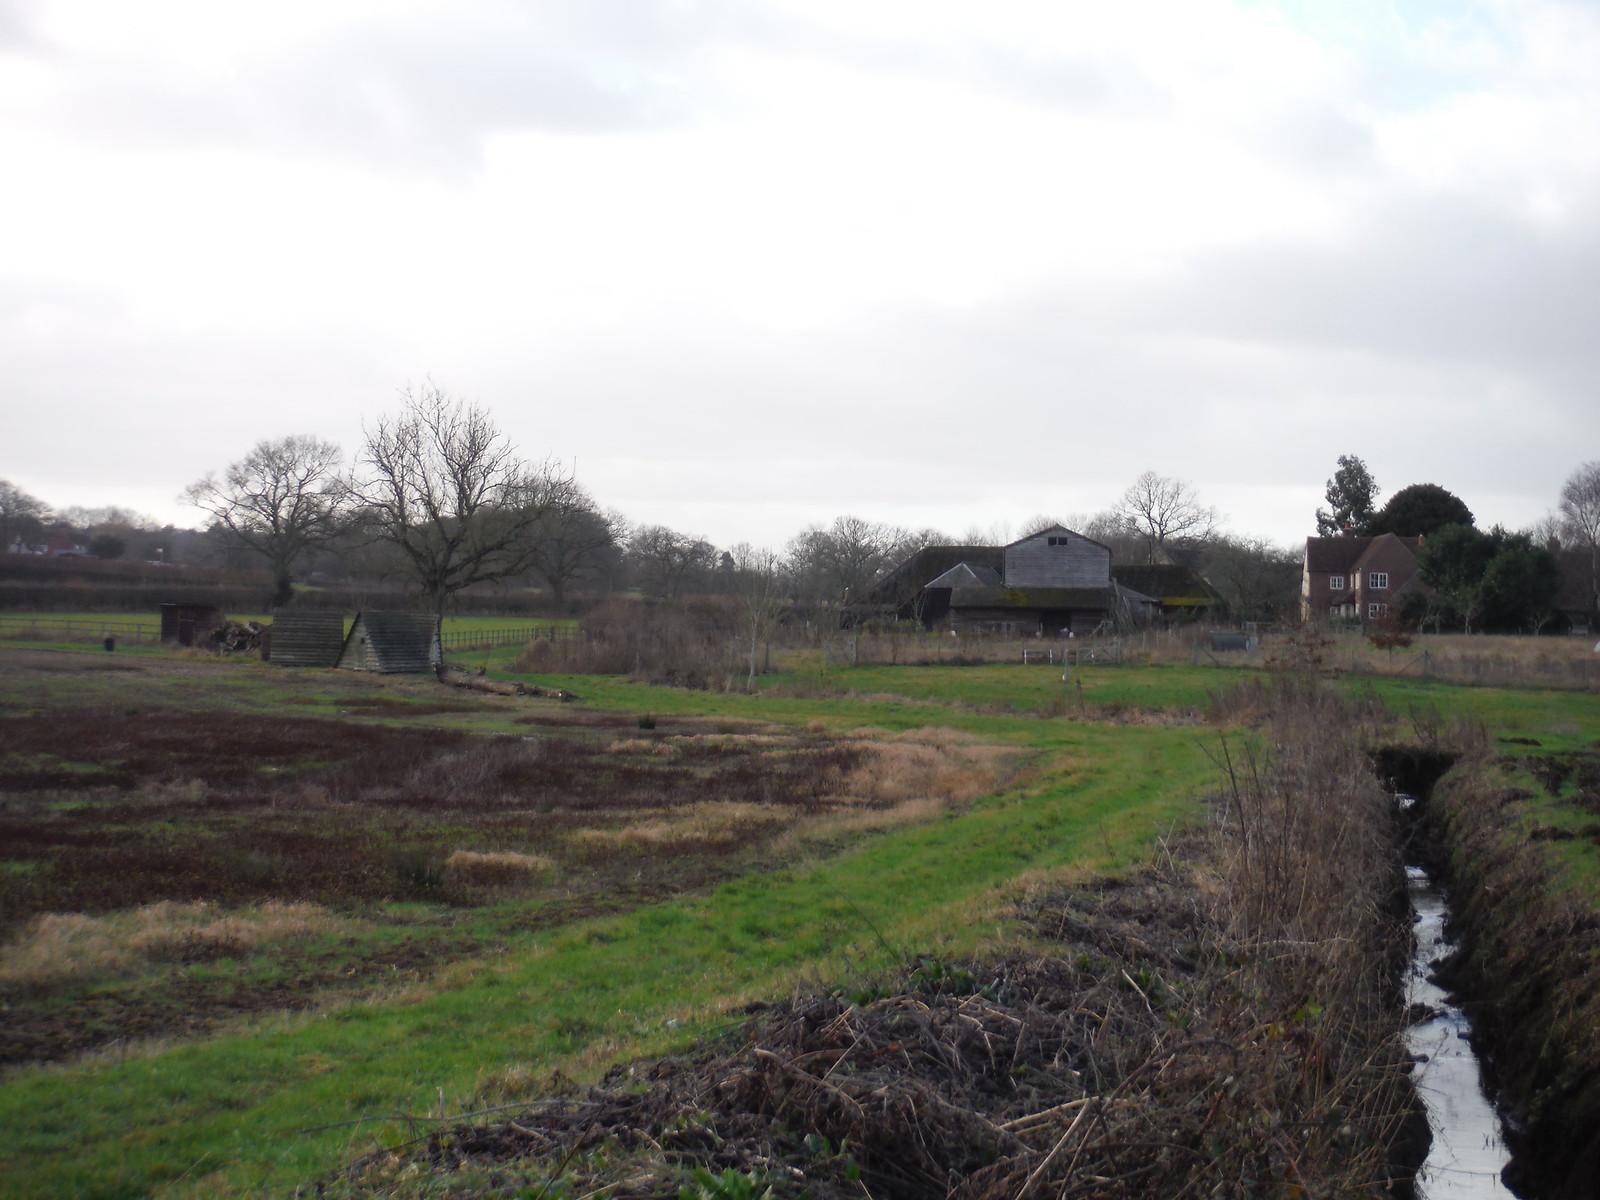 Farm with Luxury Pigsties (?) SWC Walk 34 Newbury Racecourse to Woolhampton (Midgham Station)